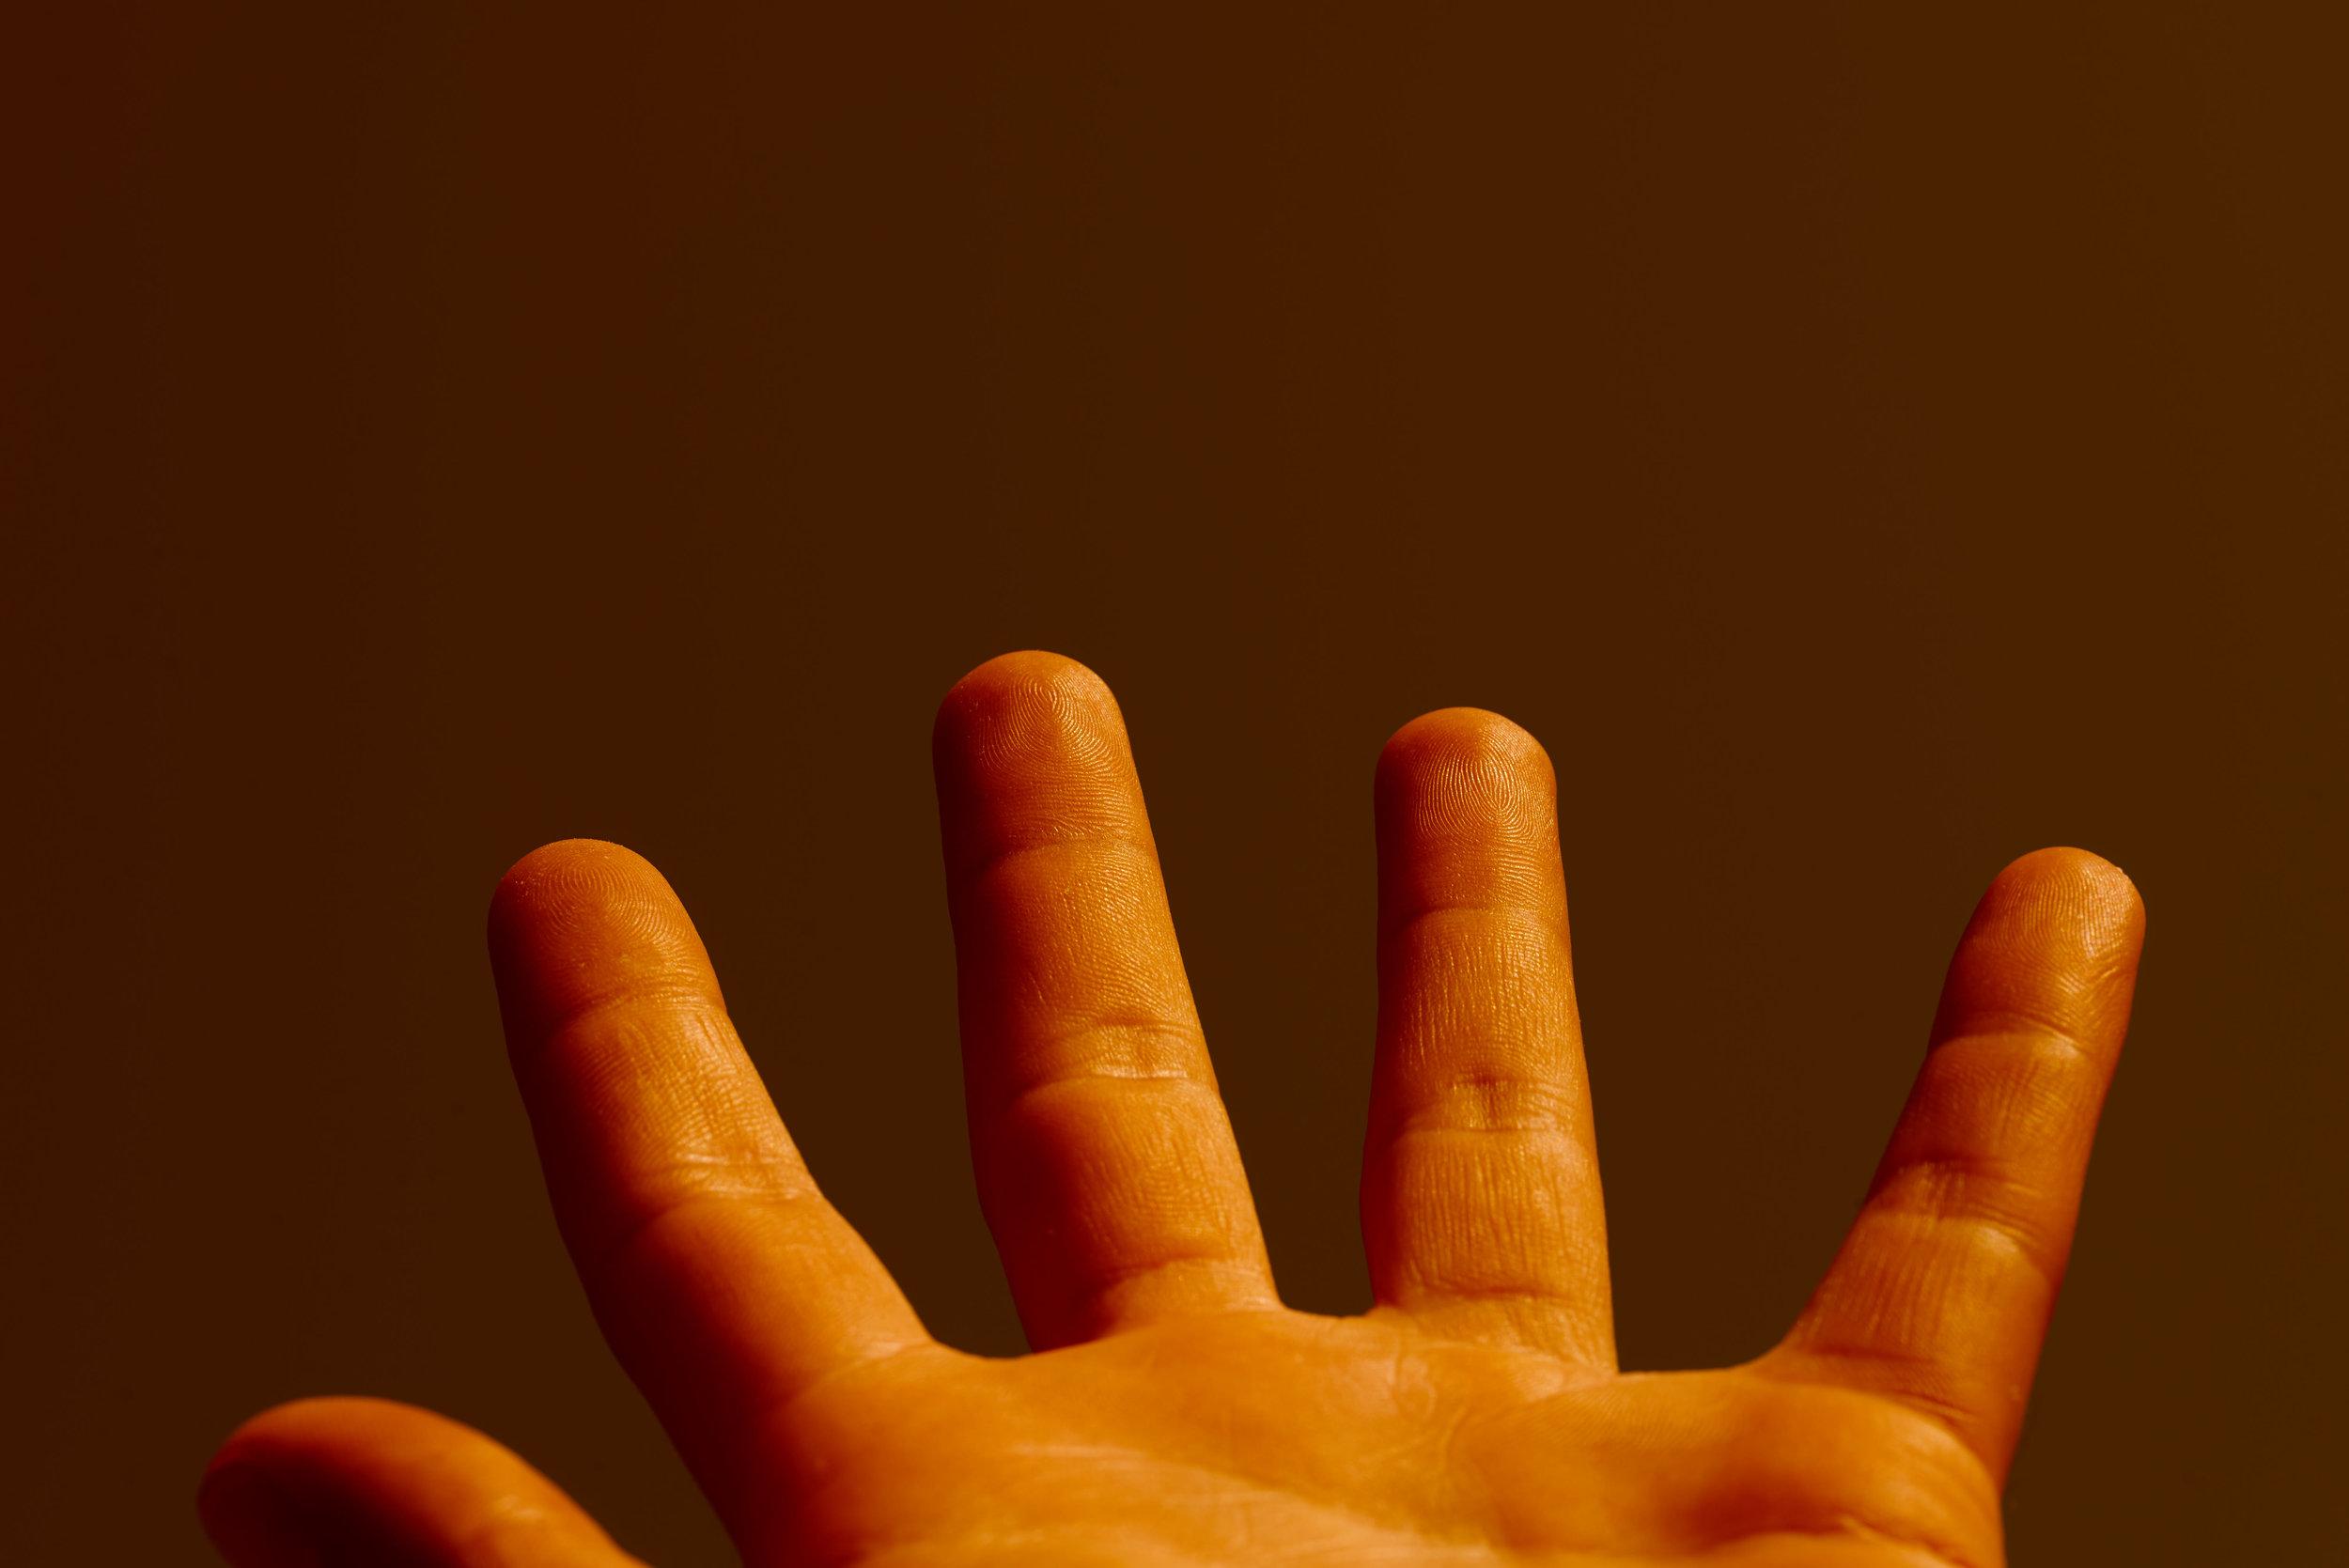 thumb up-8339.jpg